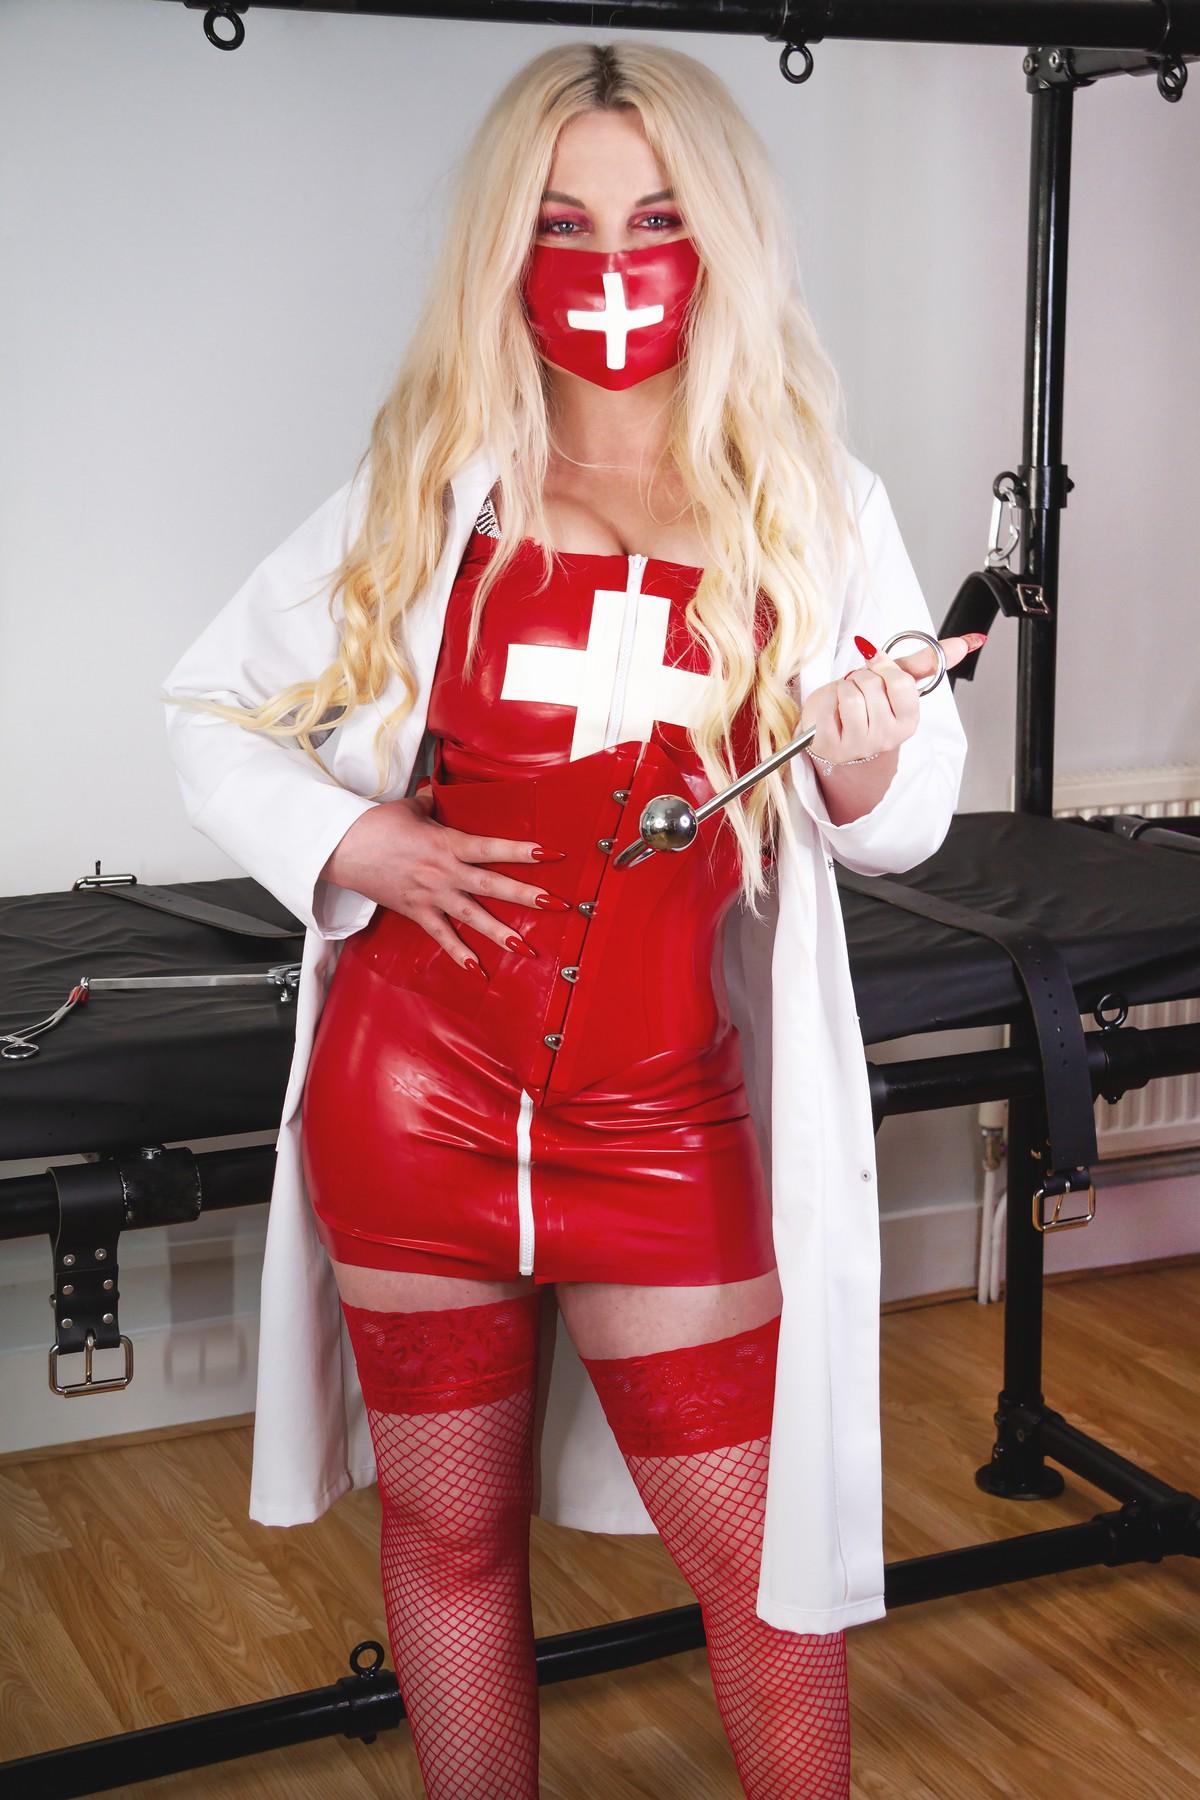 Fetish Nurse Fantasy Role Play